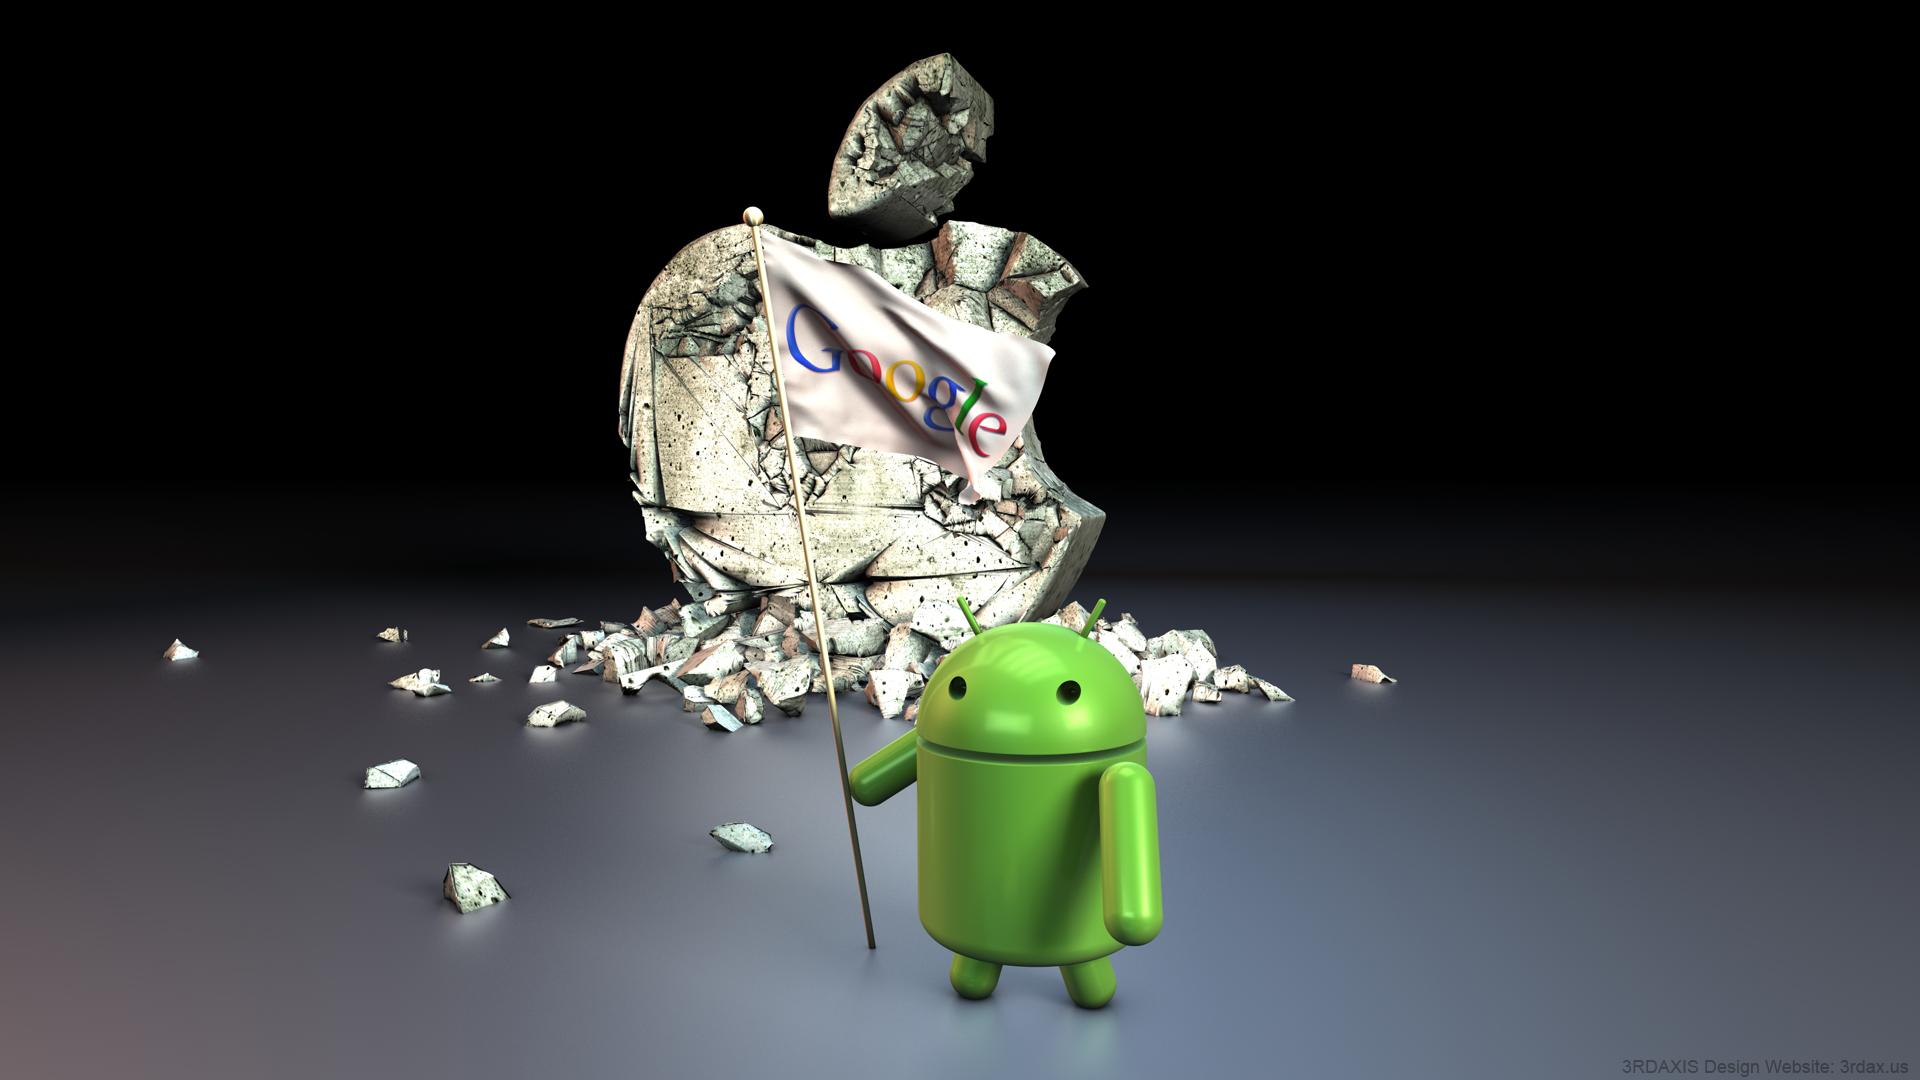 http://fc08.deviantart.net/fs71/f/2011/136/9/b/android_takeover_by_3rdaxisdesign-d3gb79l.jpg